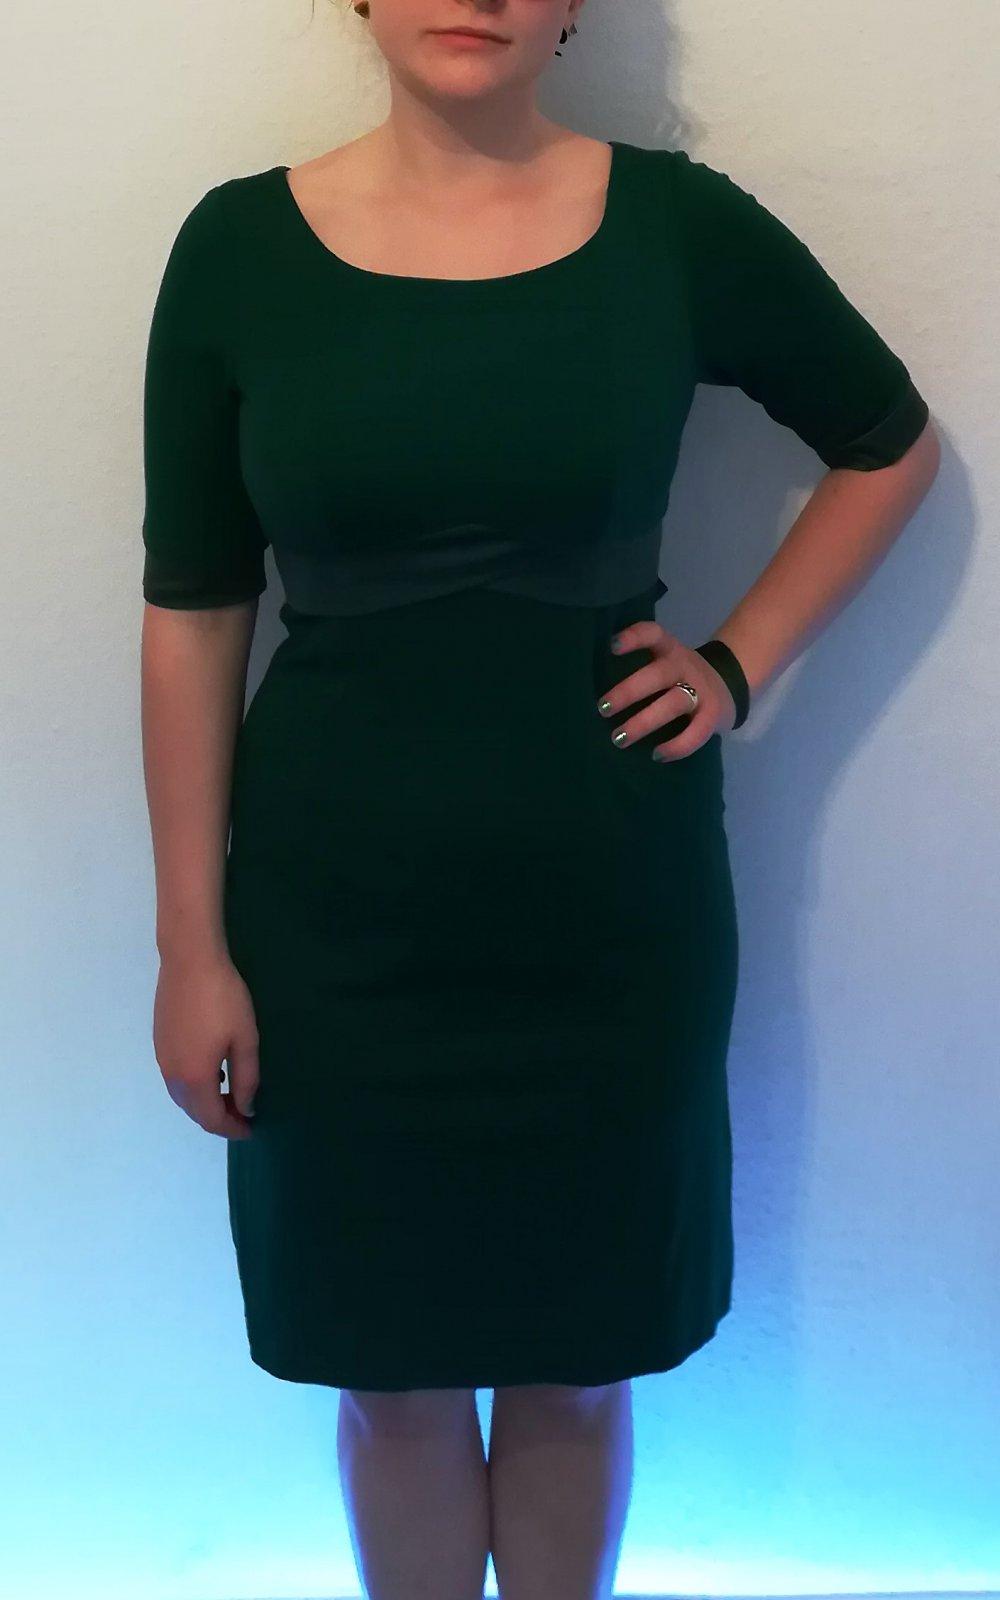 fever london - grünes abendkleid mit satinschleife größe 38